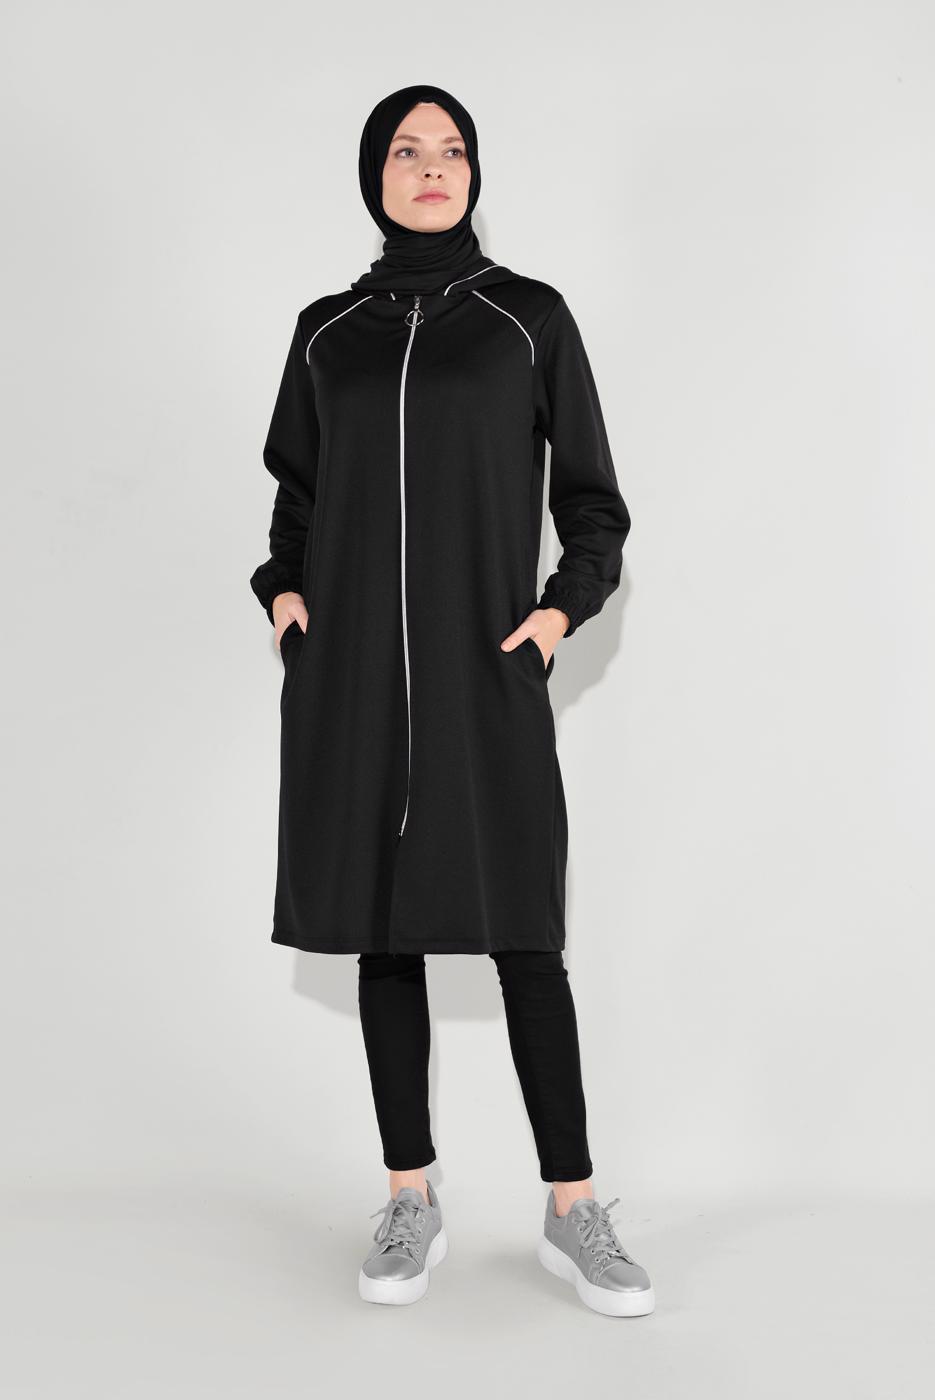 Female BLACK ZIPPED HOODED JACKET 6036